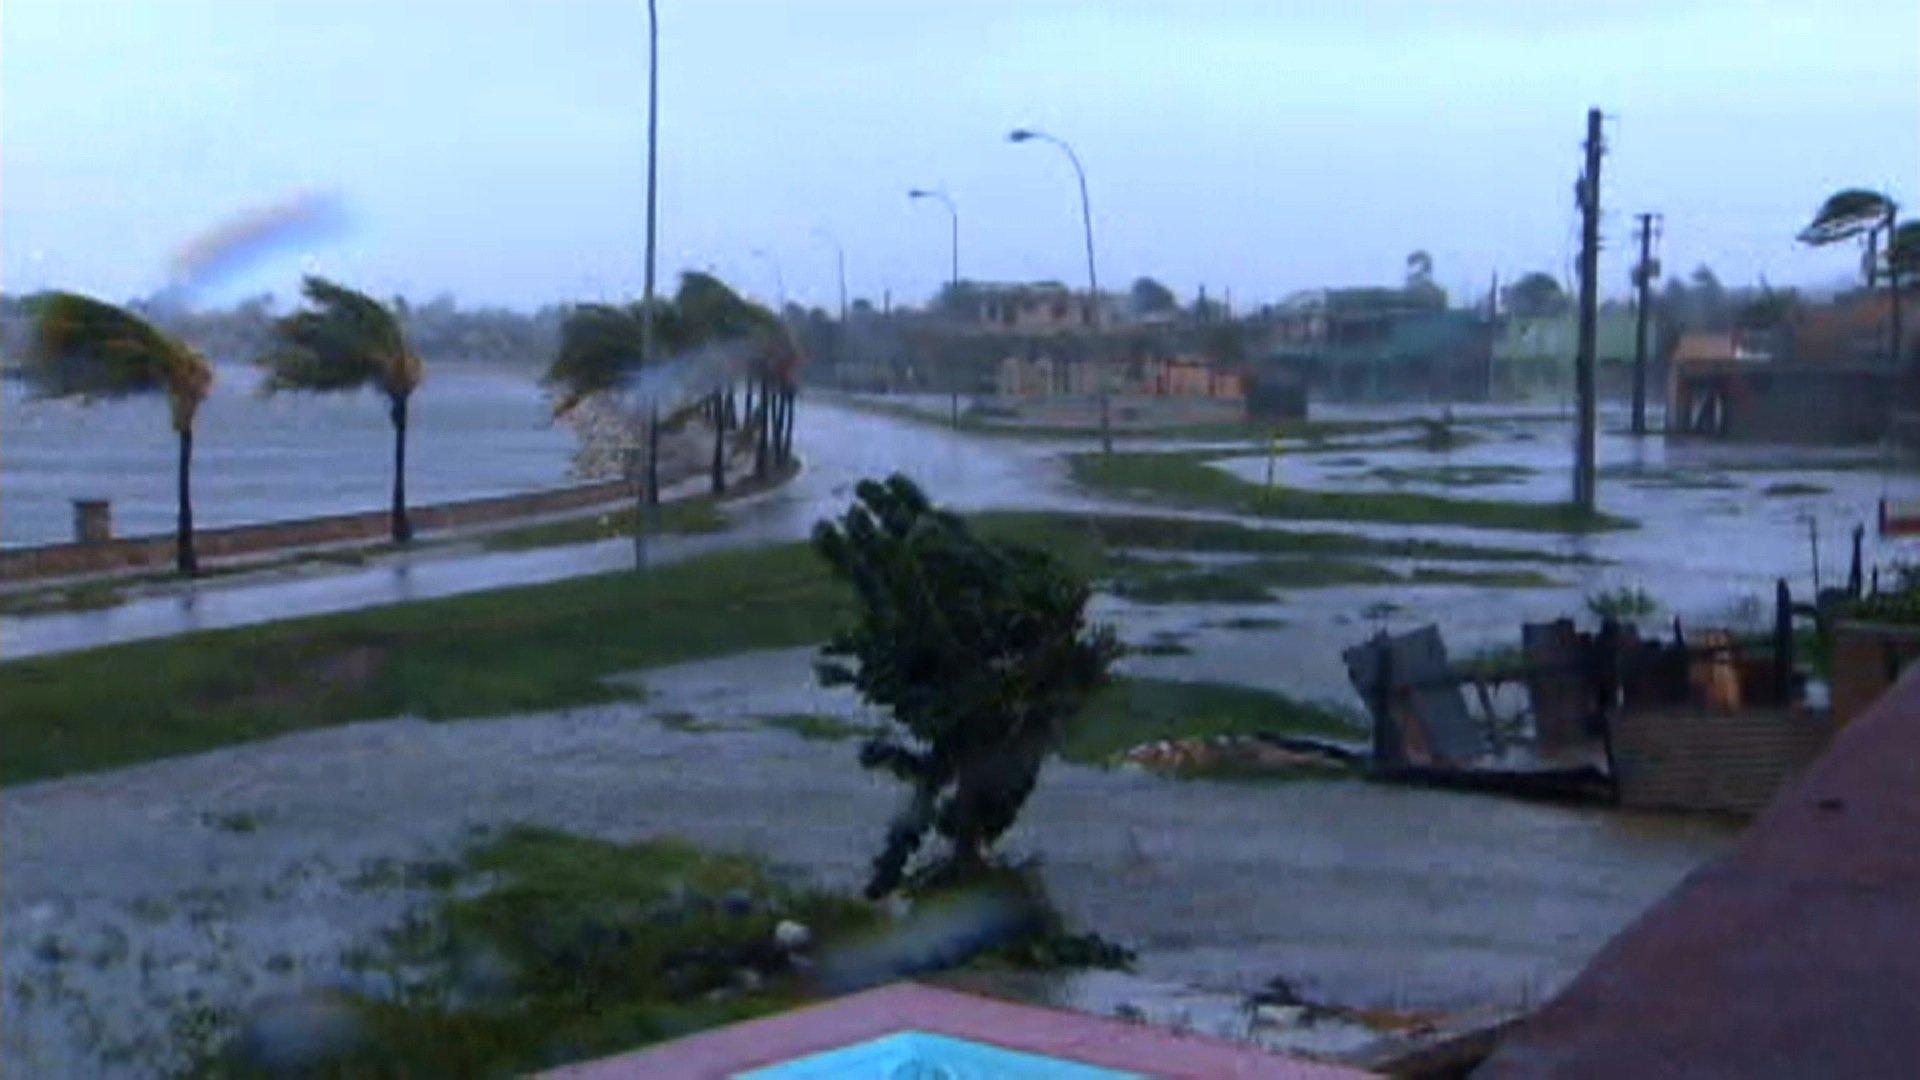 How to Help Hurricane Irma Victims